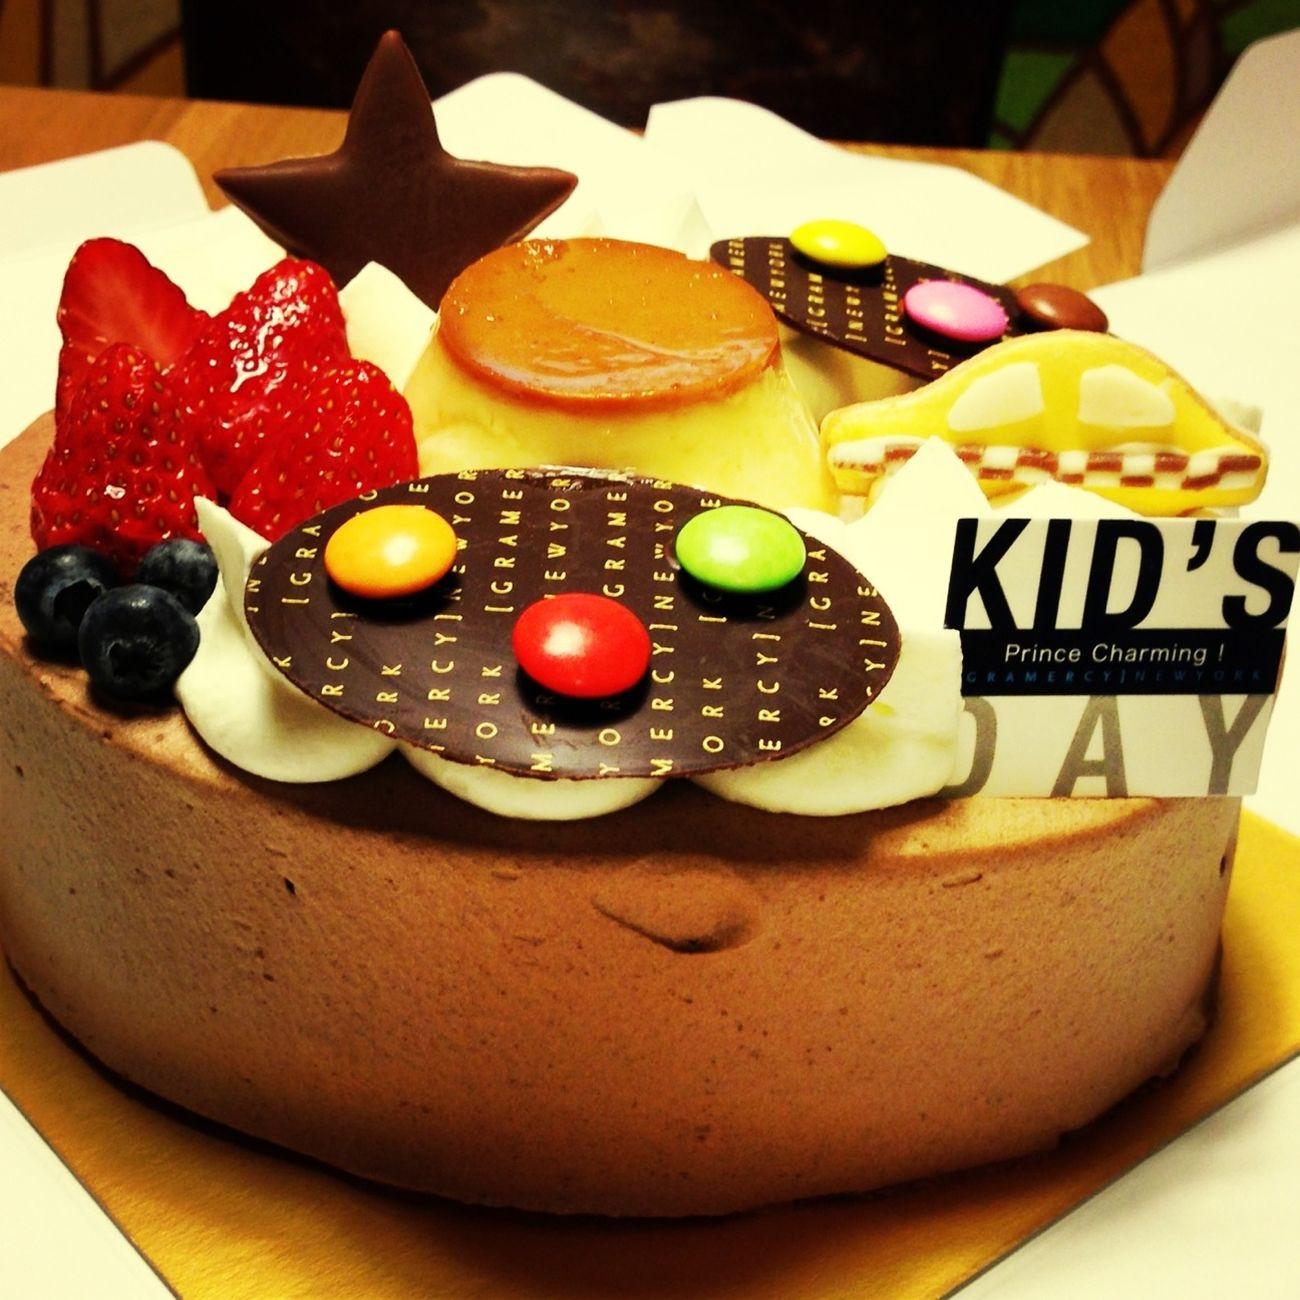 Kids Cake KID'S DAY